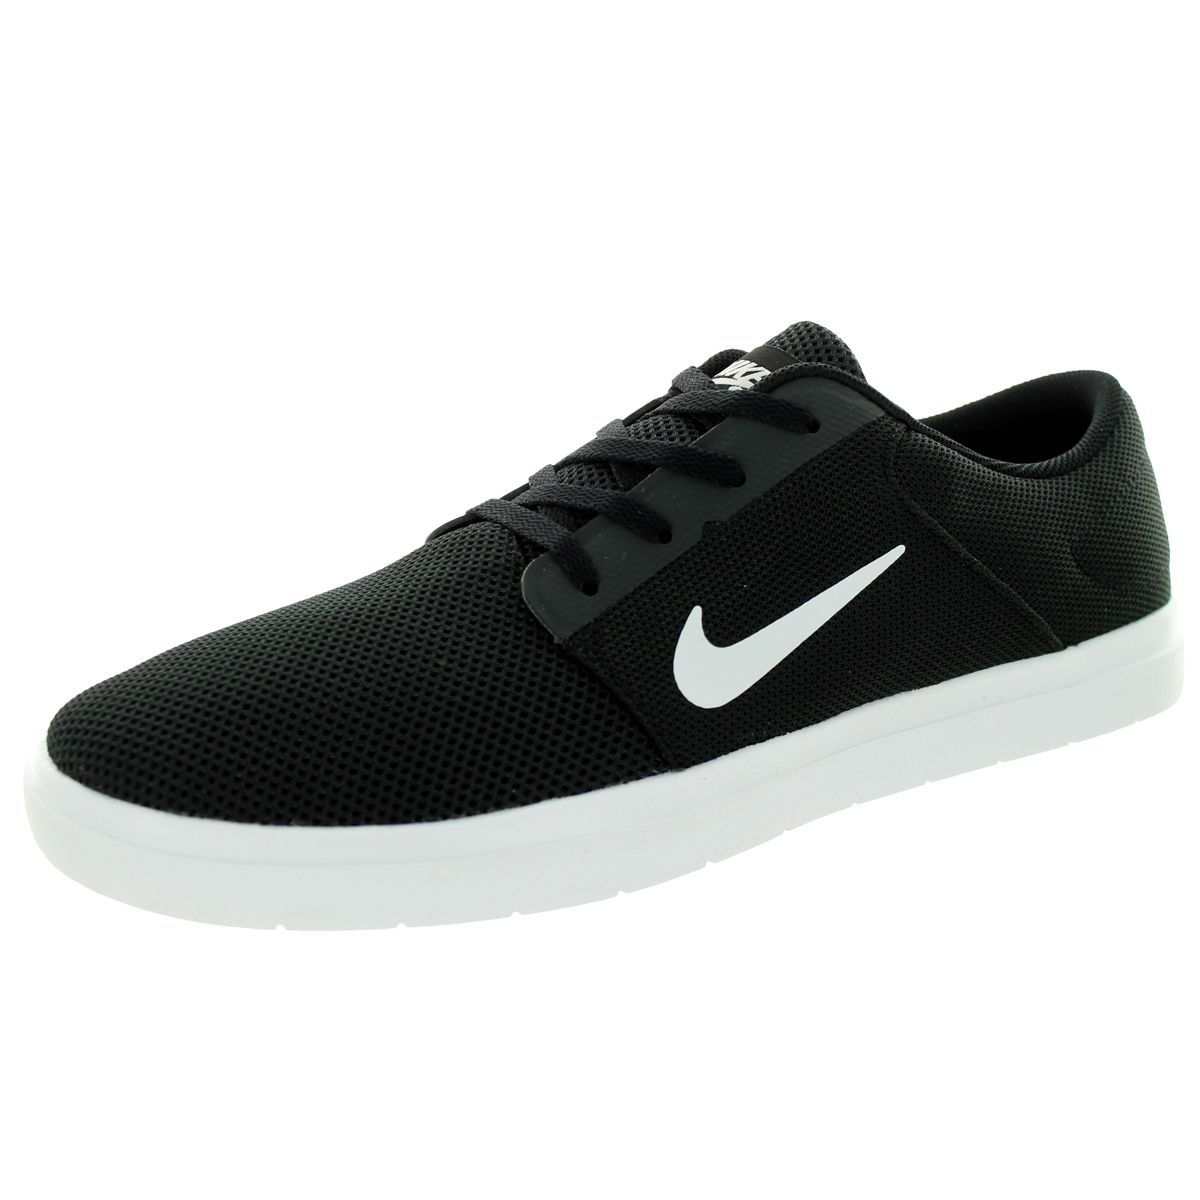 Nike Men's Sb Portmore Renew Black/White/Anthracite Skate Shoe by Nike